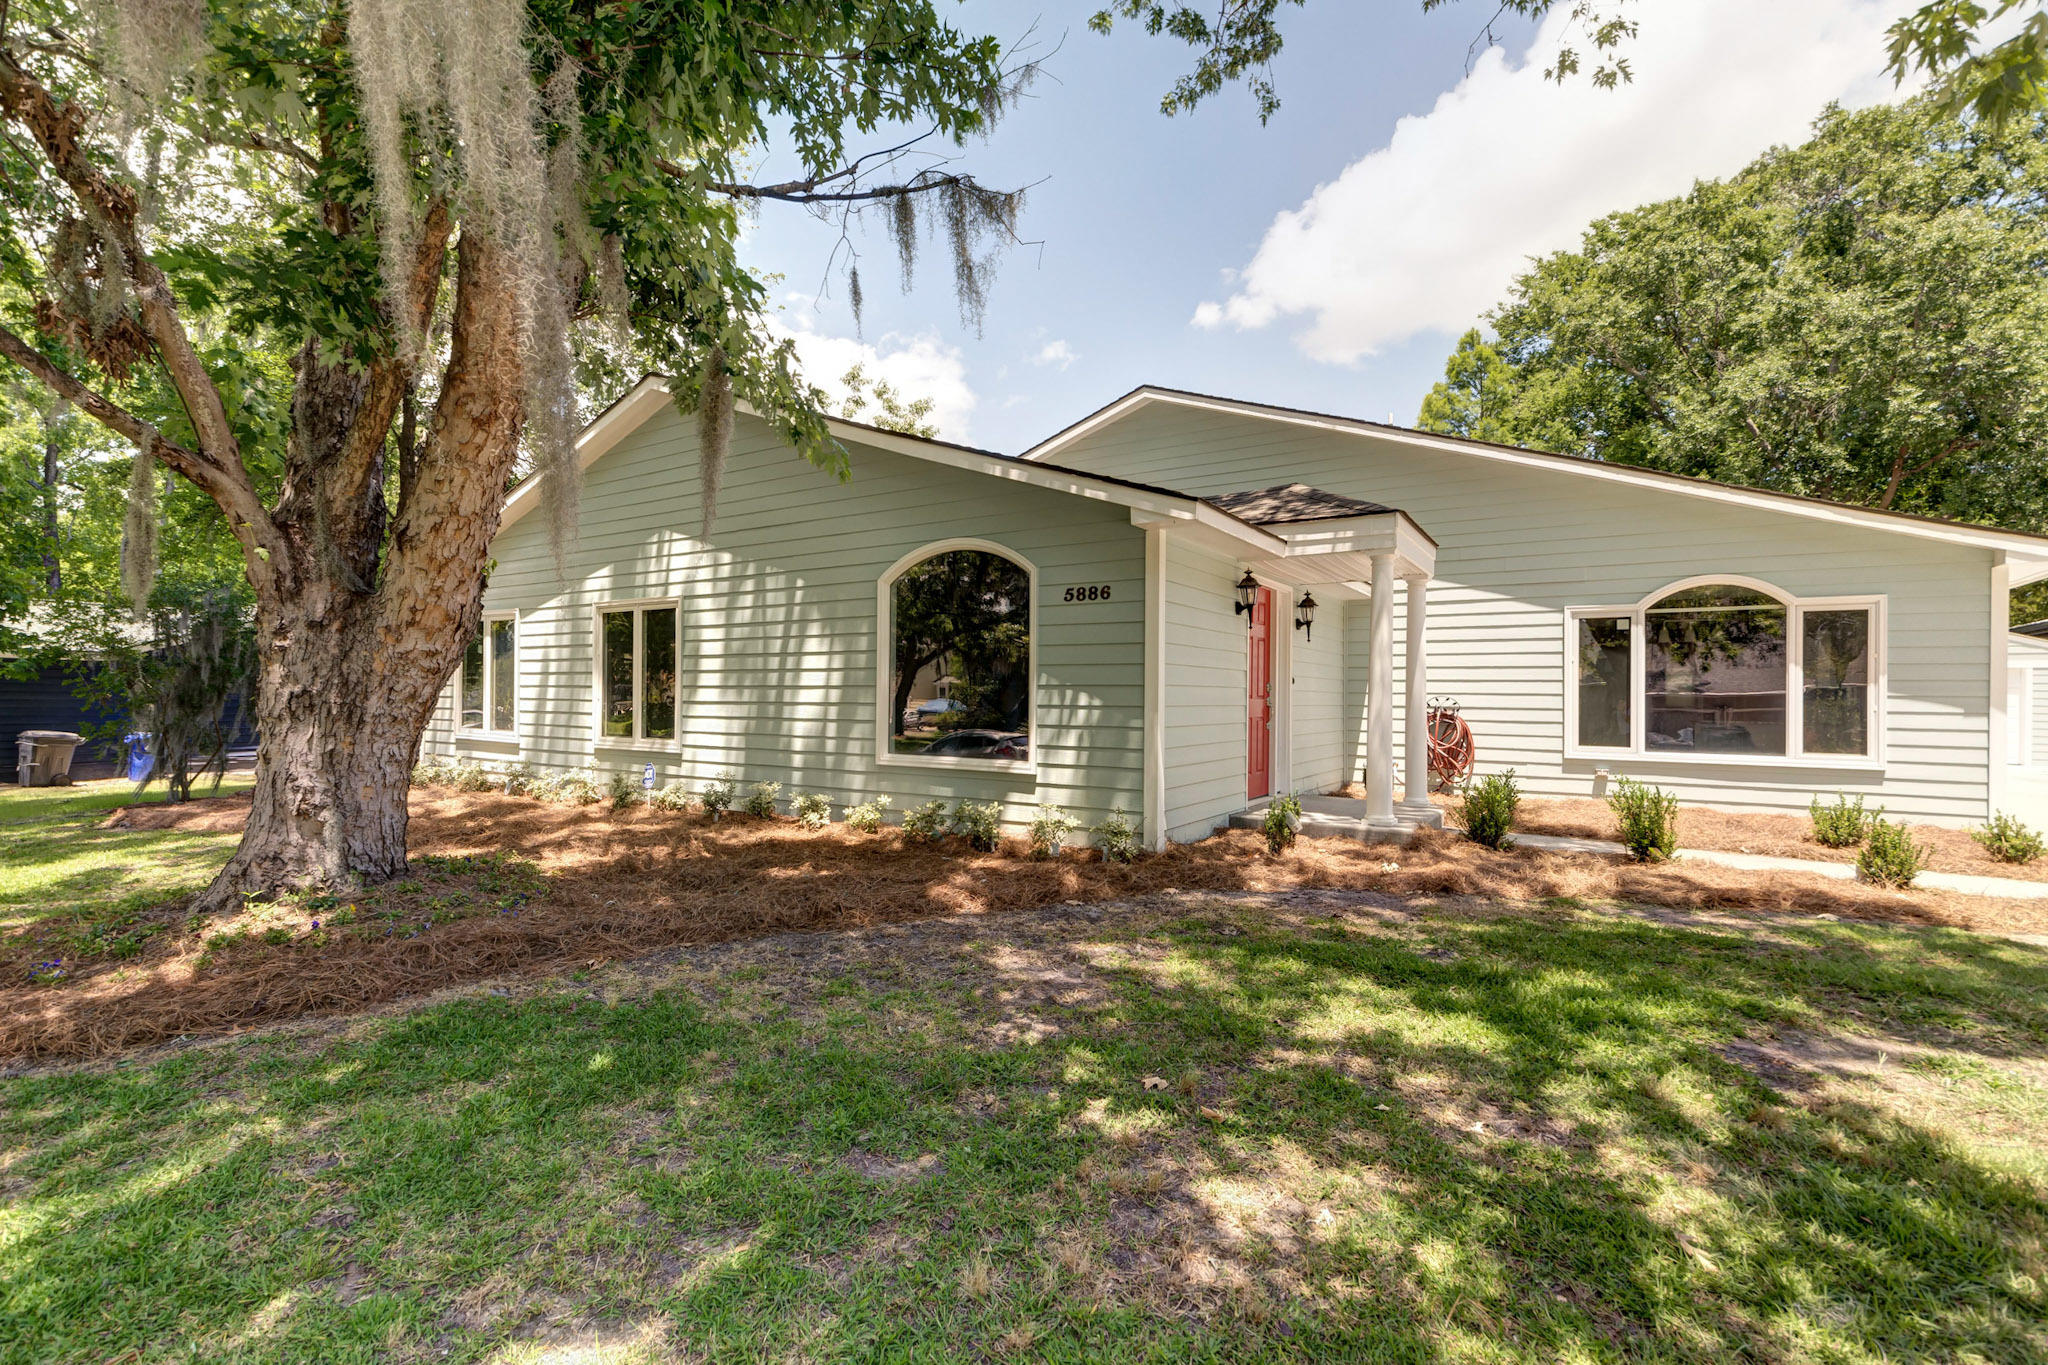 Covington Hills Homes For Sale - 5886 Ryans Bluff, North Charleston, SC - 0